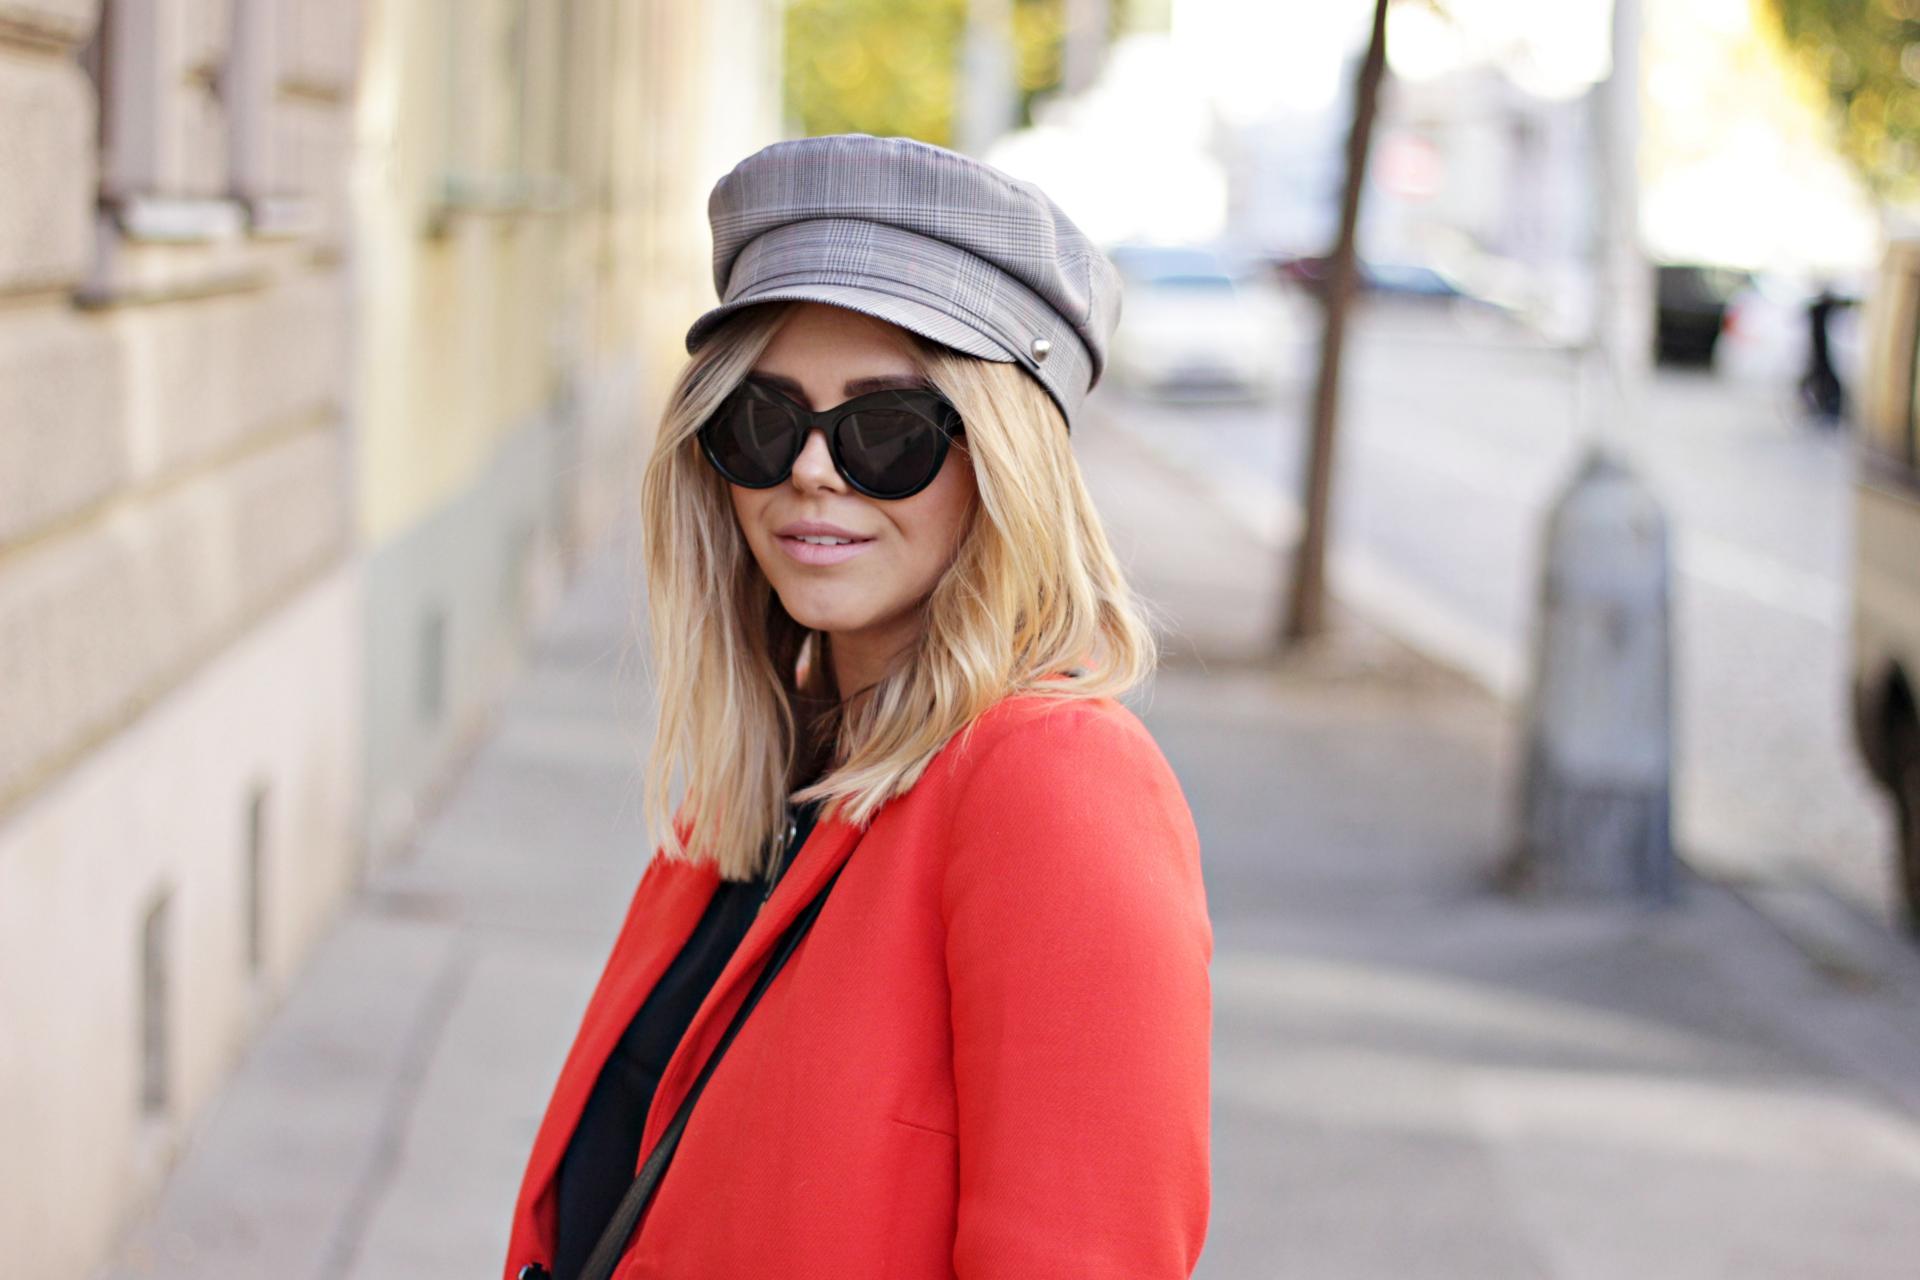 Red coat inspo